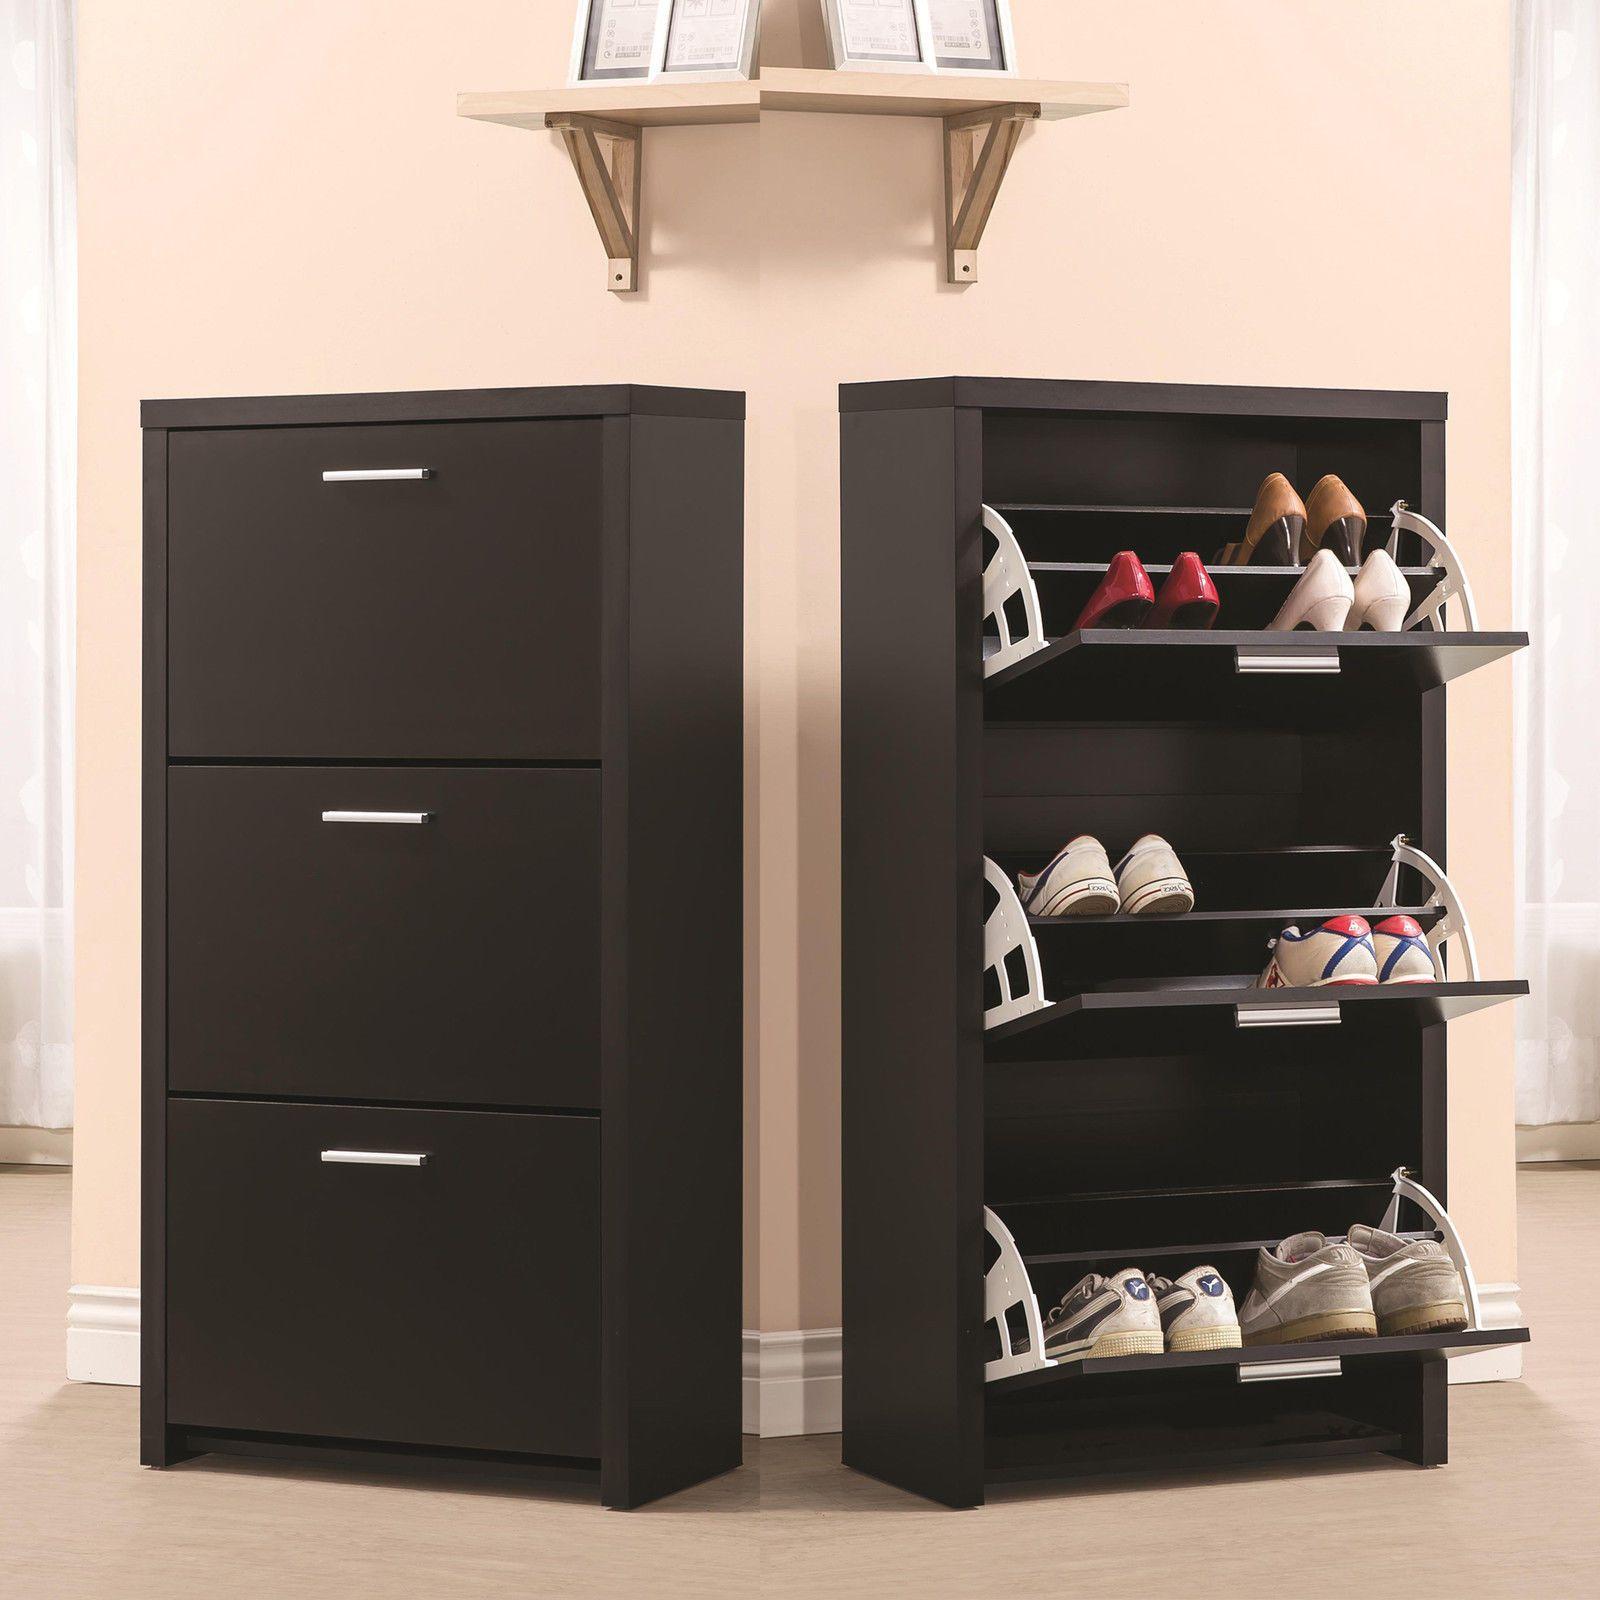 storage options concept hgtv shoe size bench stirring organizer of design cabinet image buy full